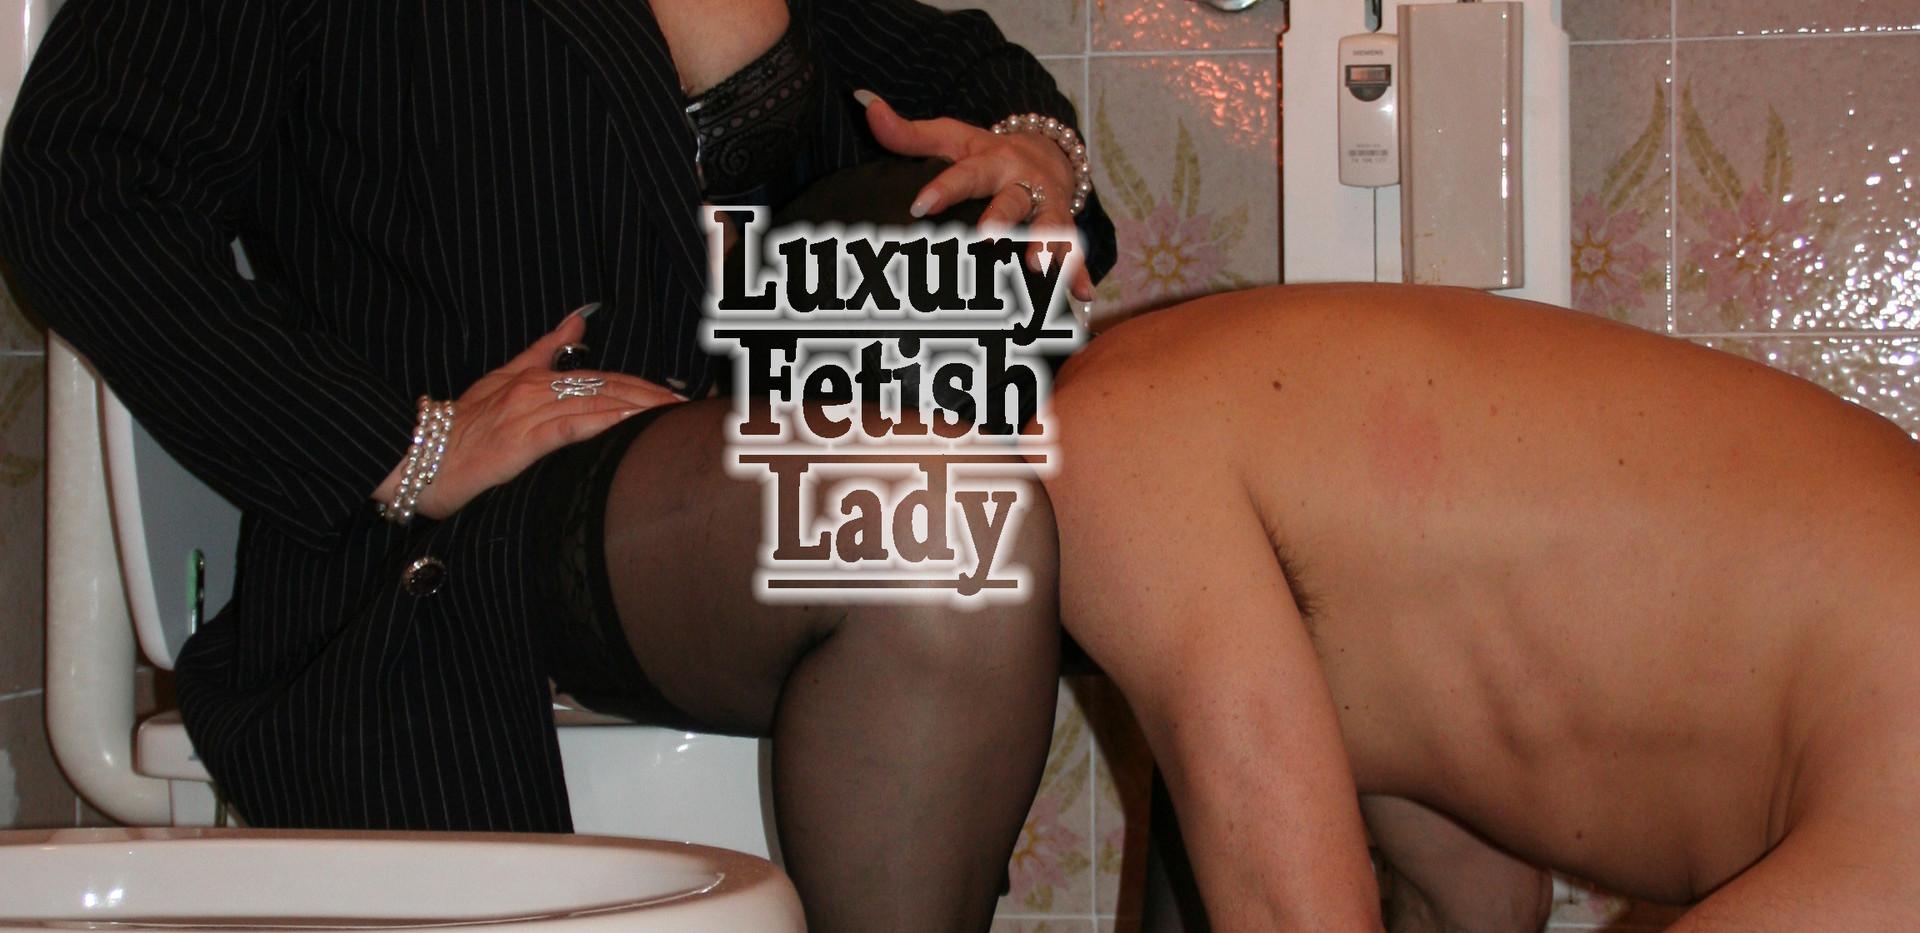 Luxury Fetish Lady Mistress a Brescia Ve